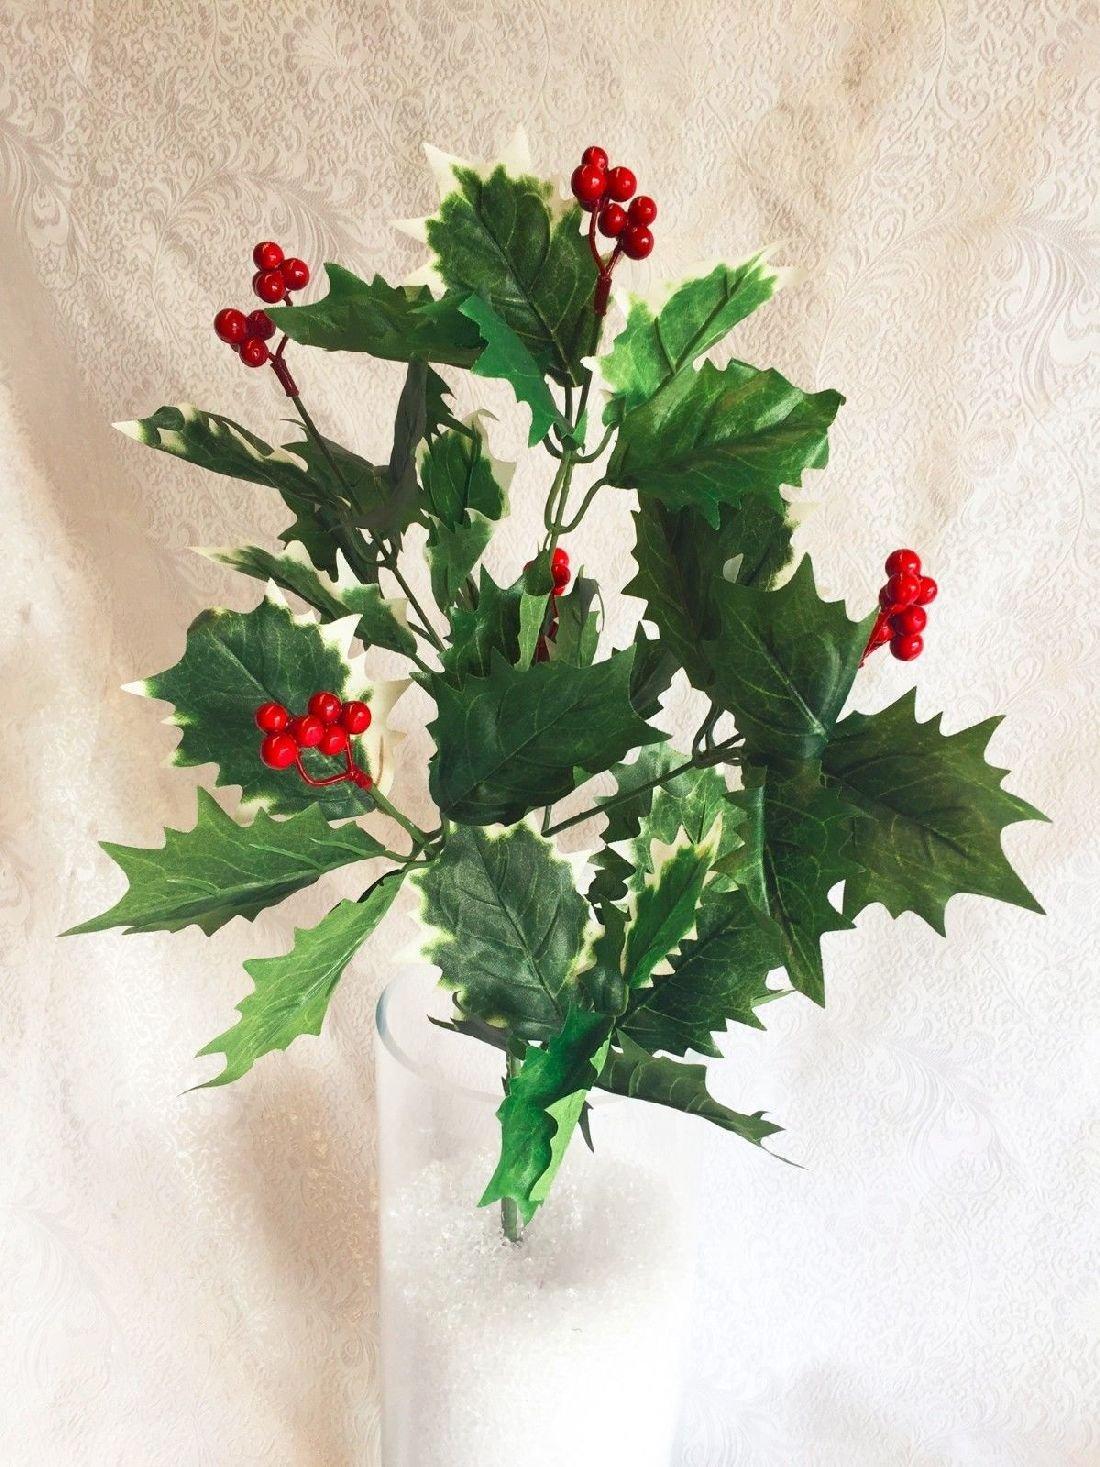 Christmas Greenery Centerpieces.1pcs Holly Berry Bush Christmas Filler Greenery Silk Wedding Flowers Centerpieces